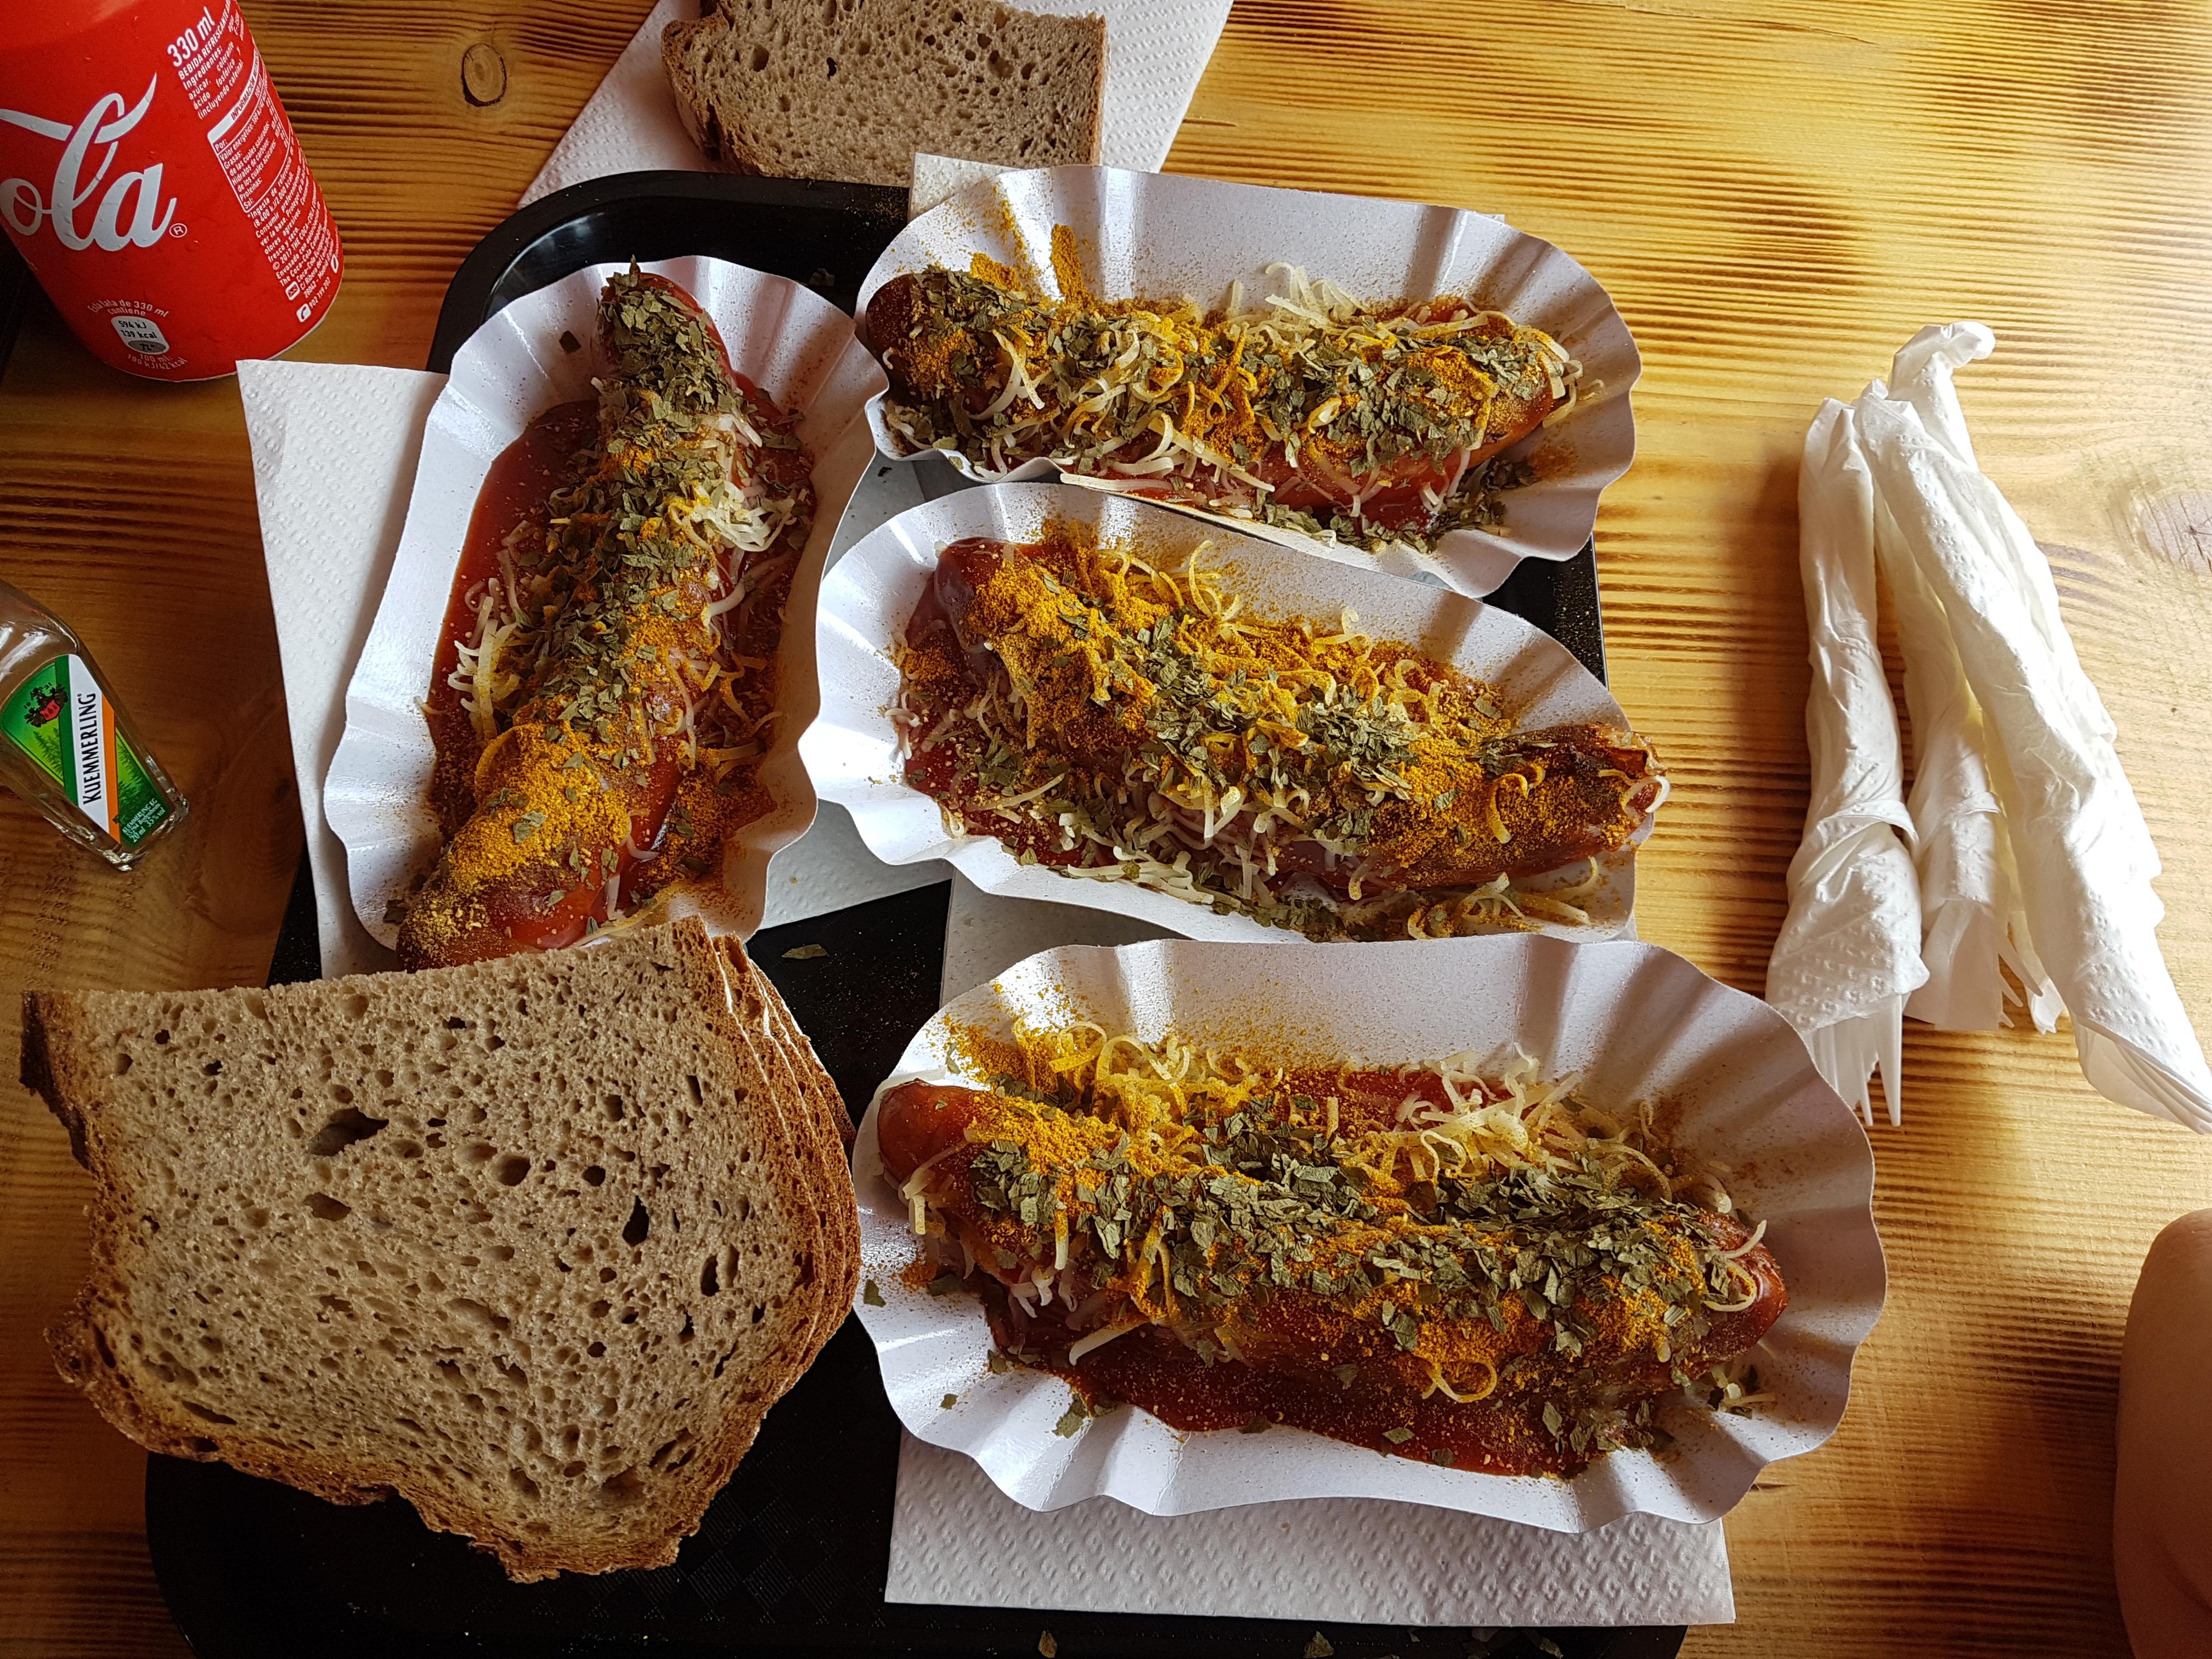 http://foodloader.net/Holz_2018-04-19_DJ_Duese_Wurst.jpg